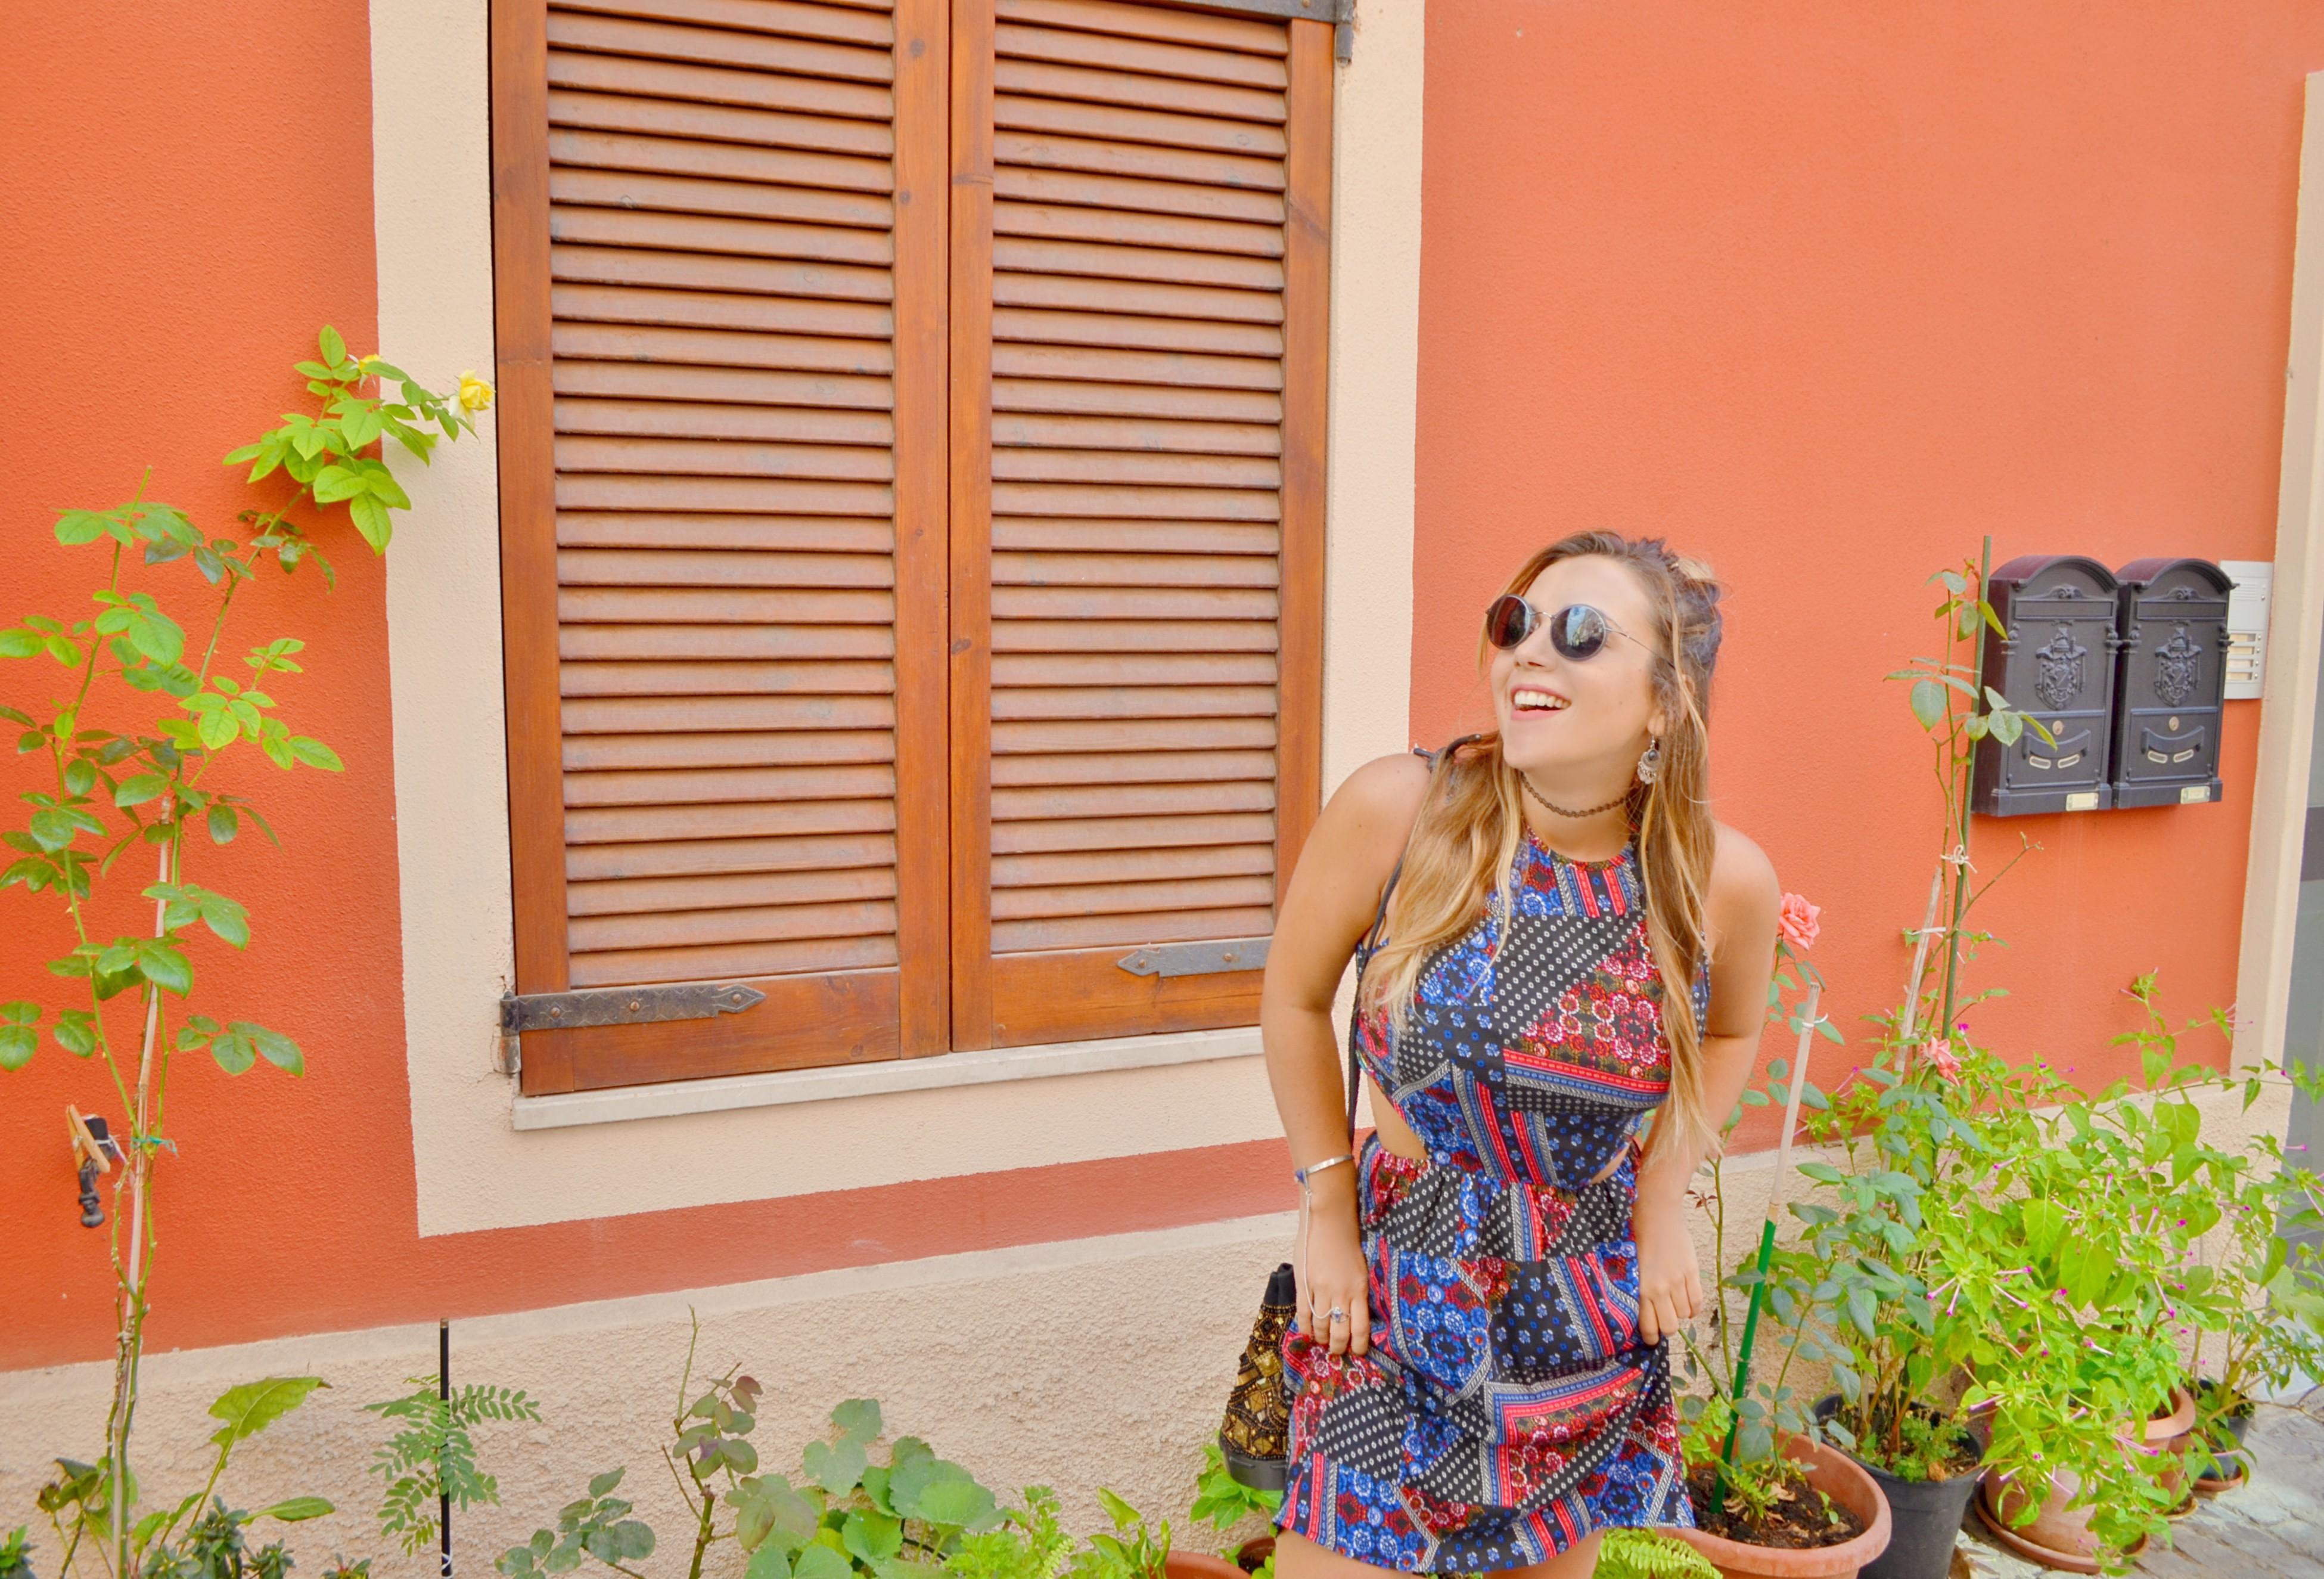 Vestidos-estampados-fashionista-ChicAdicta-influencer-Chic-Adicta-blog-de-moda-silhouette-sunglasses-PiensaenChic-Piensa-en-Chic